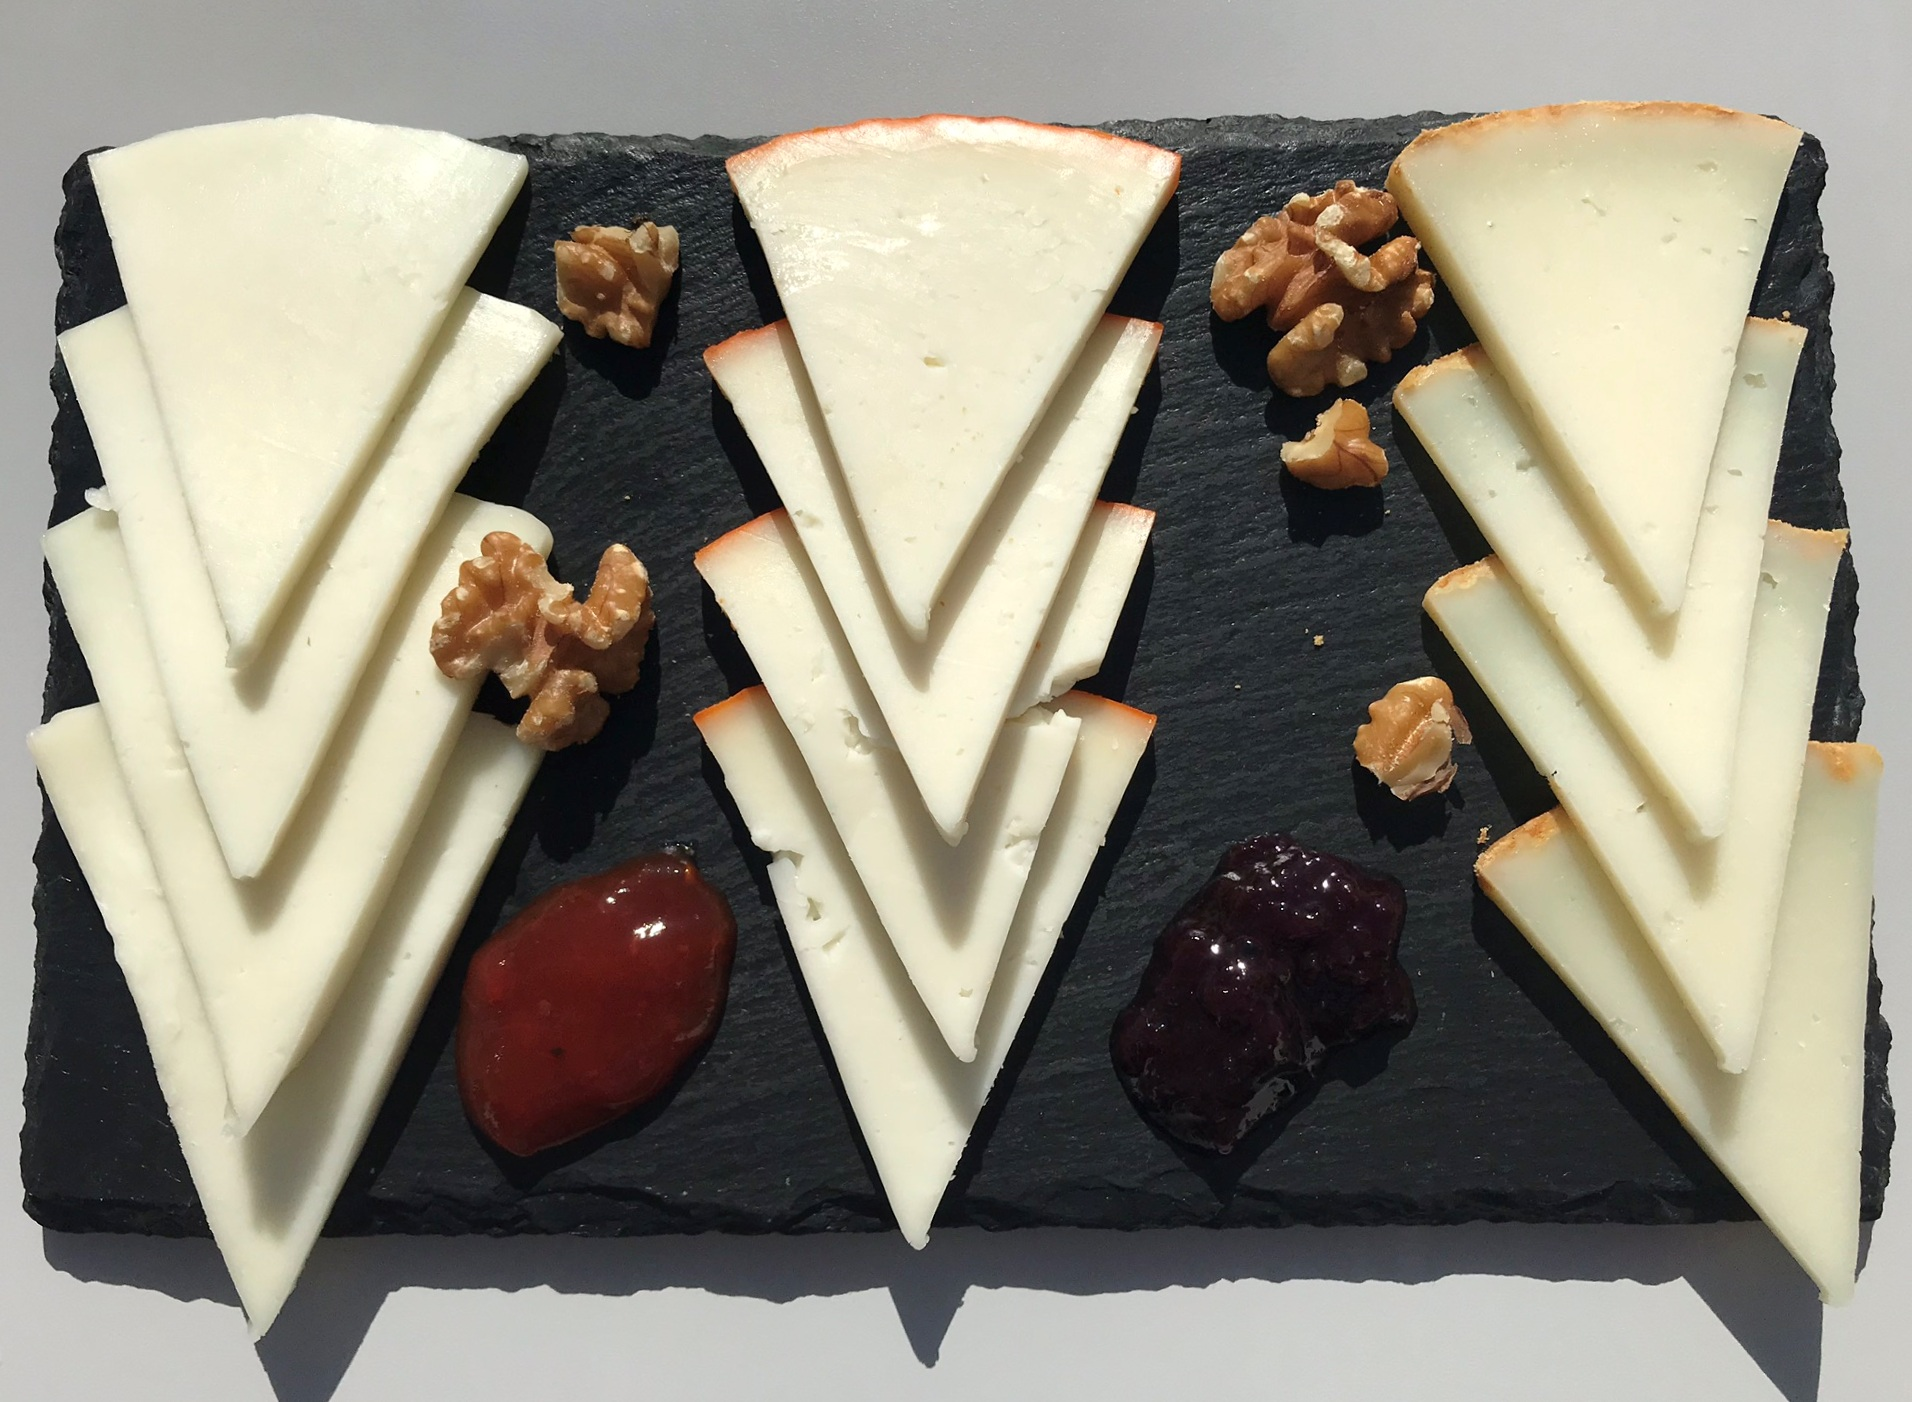 Alles Käse auf Fuerteventura #Kultding des Monats Dezember 2